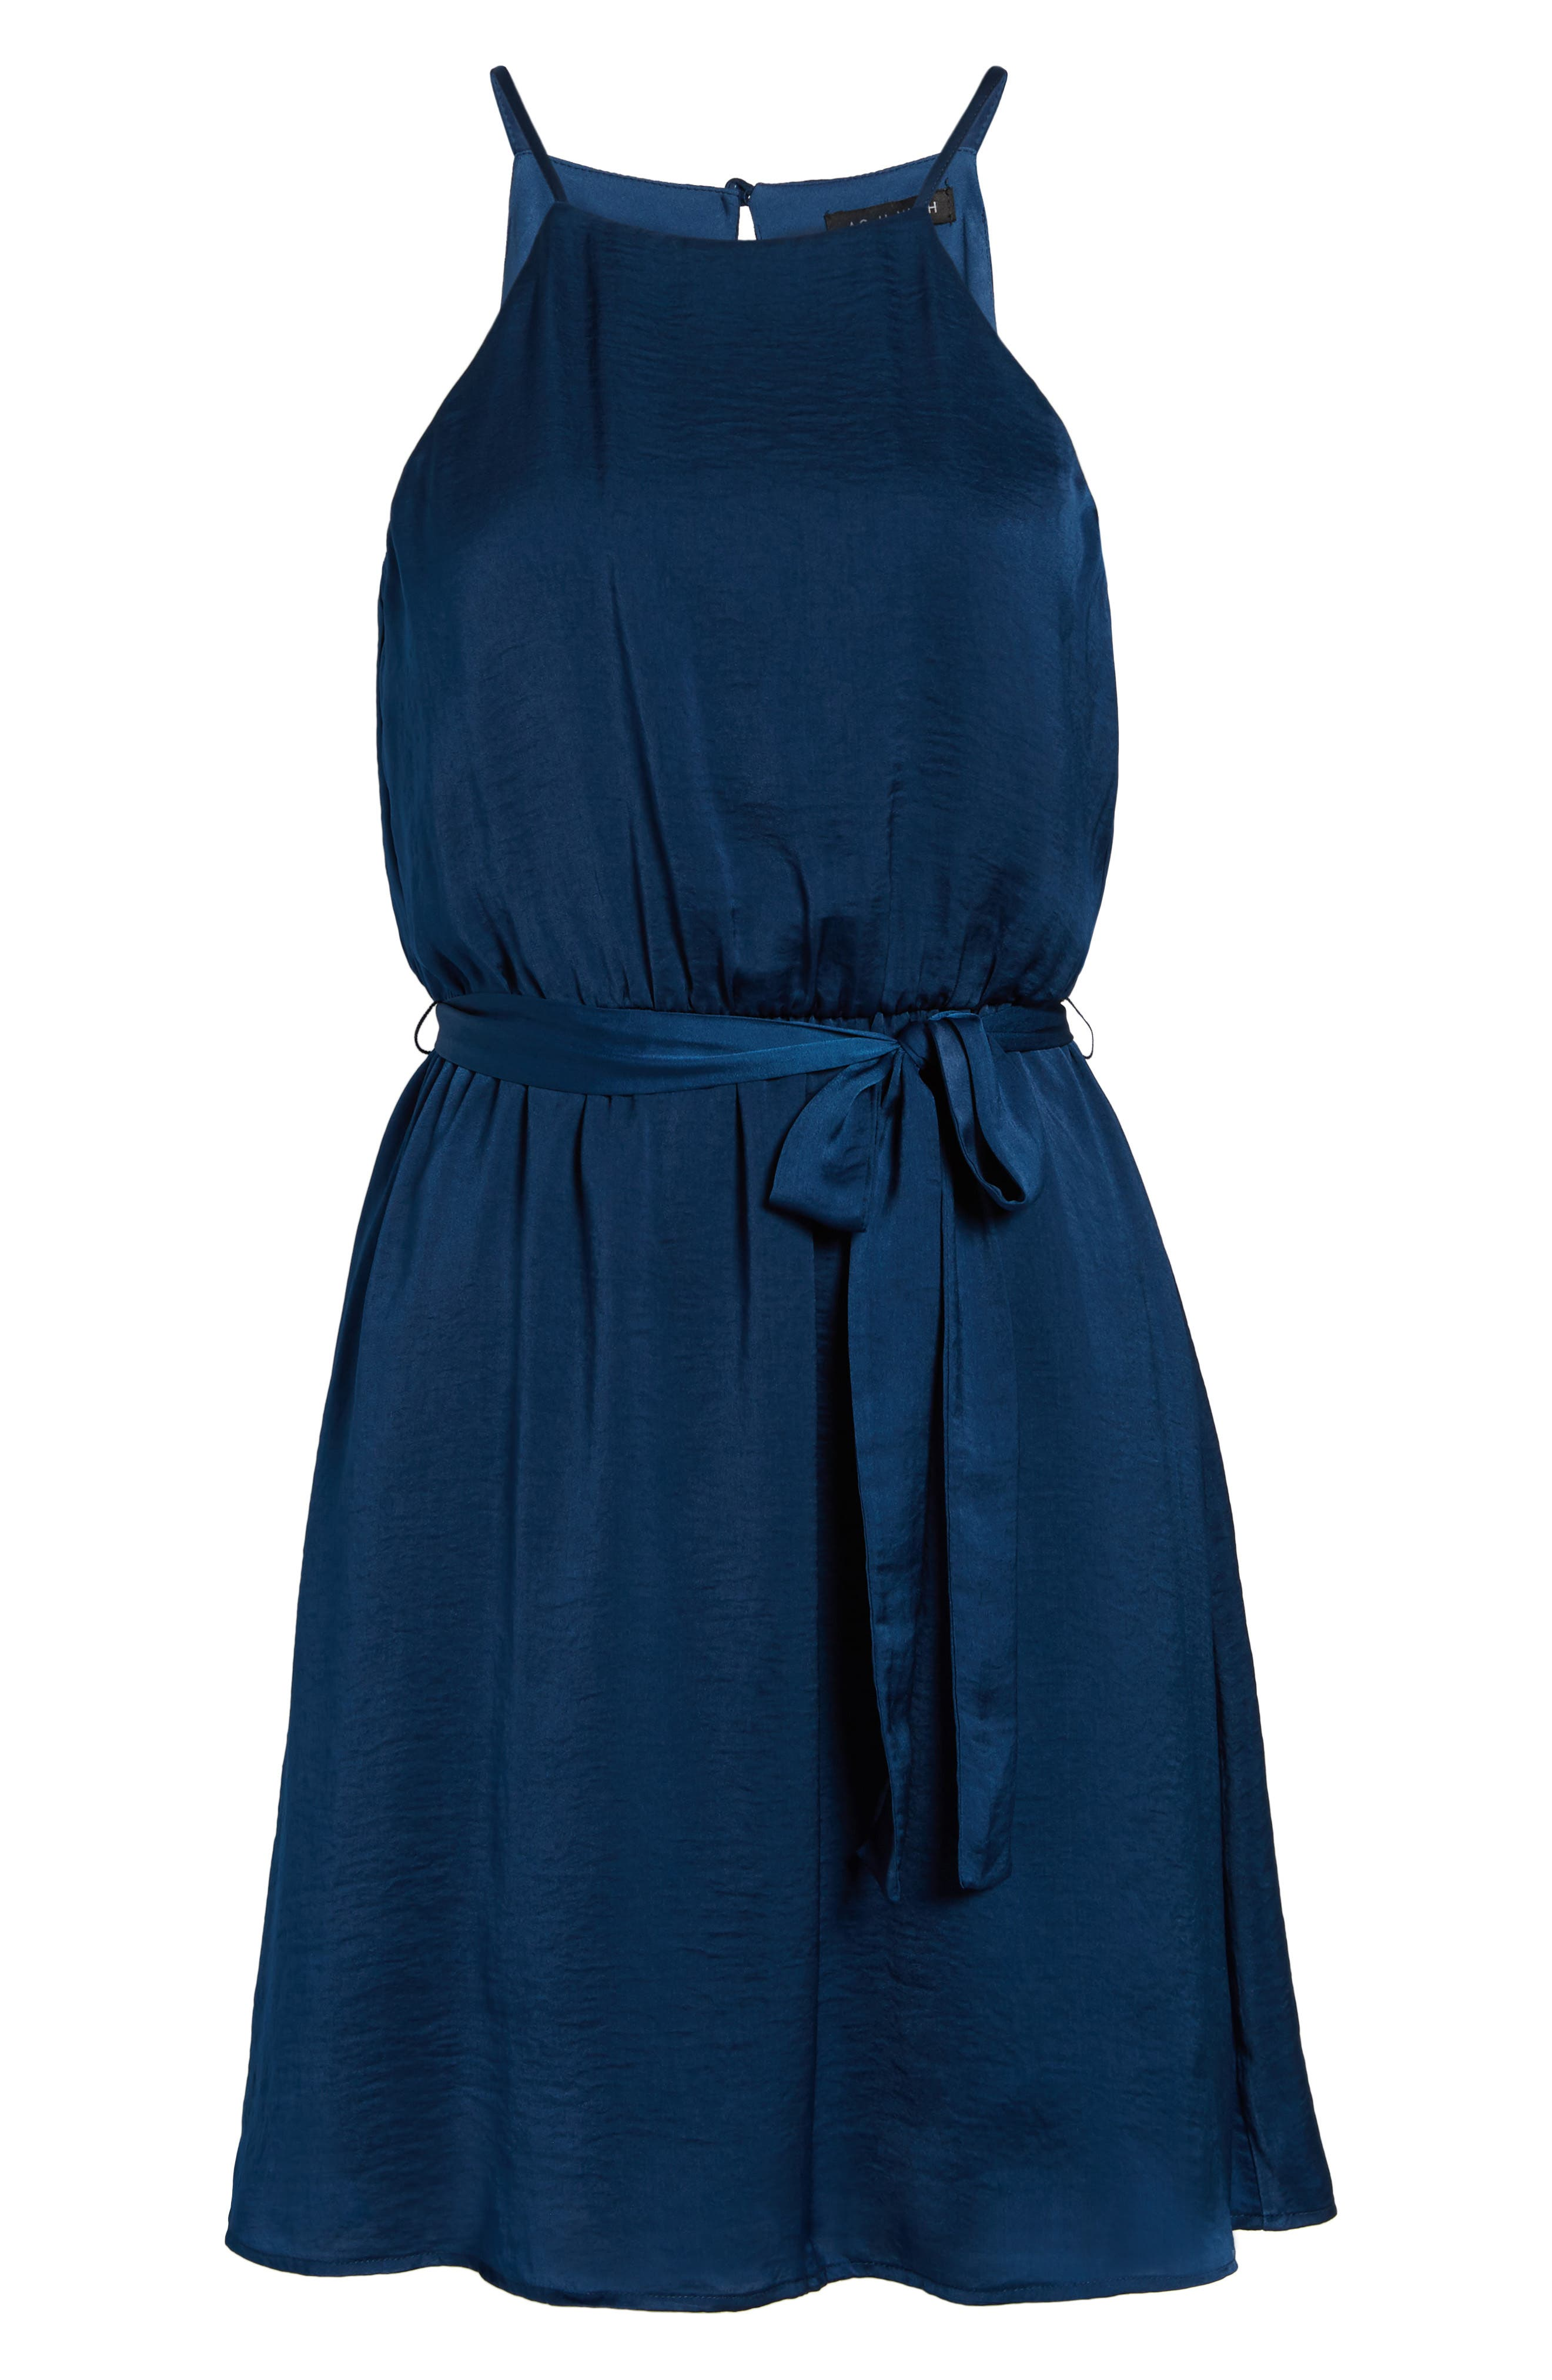 As You Wish Tie Waist Dress,                             Alternate thumbnail 6, color,                             400